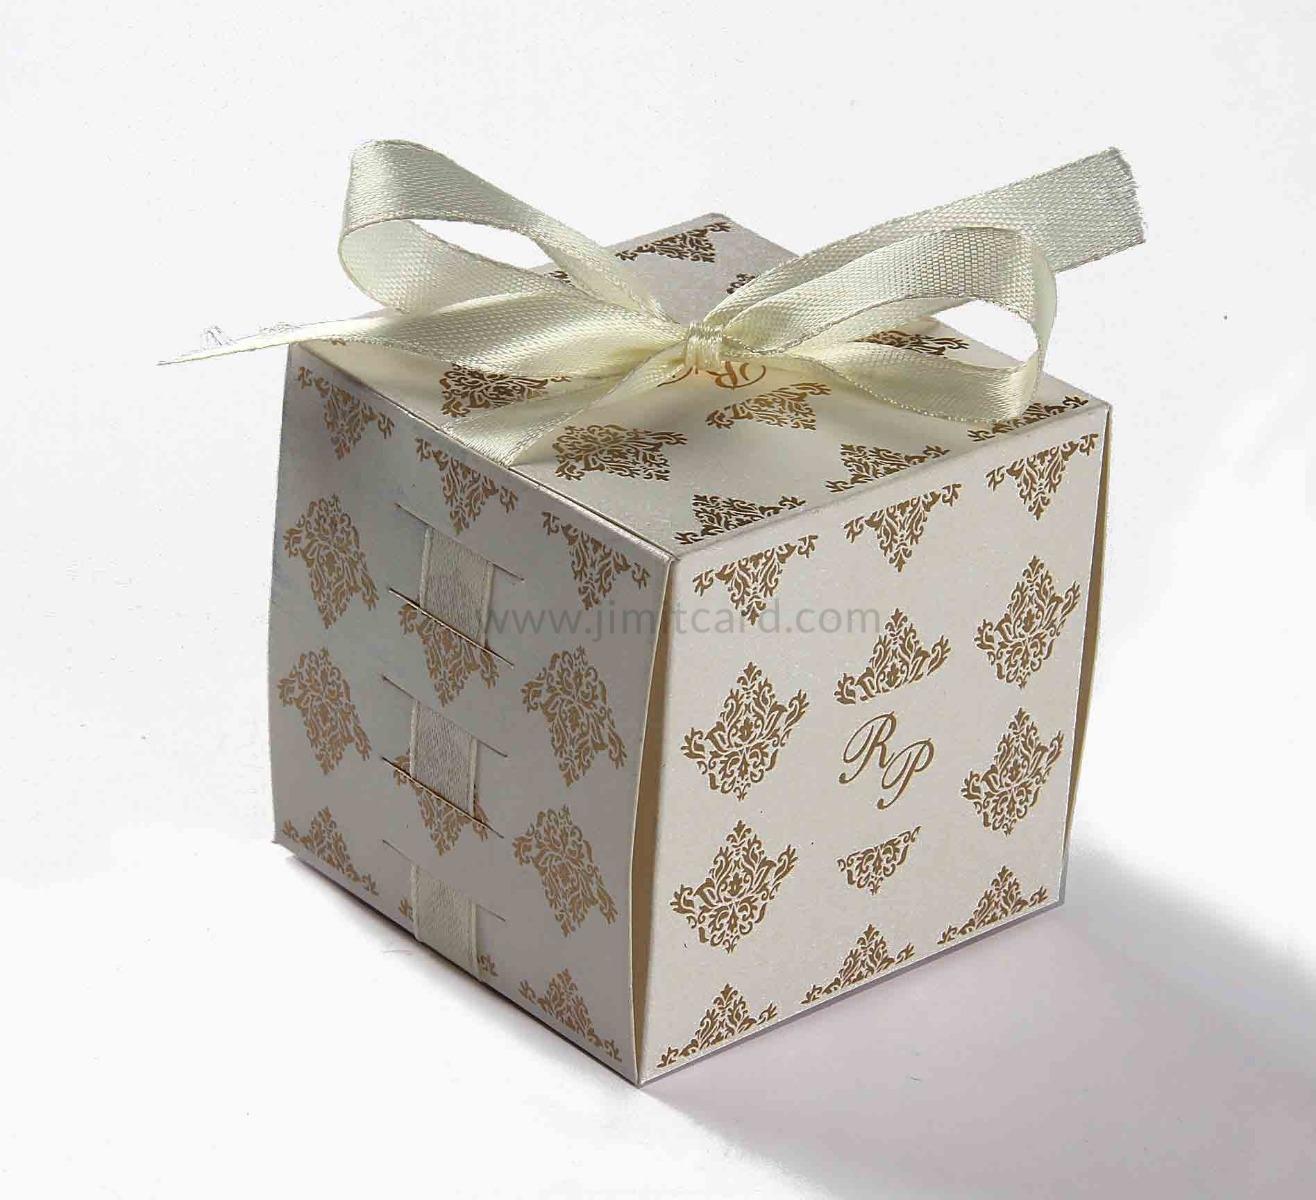 Bow Top Cube Favor Box No 5 - White-8542